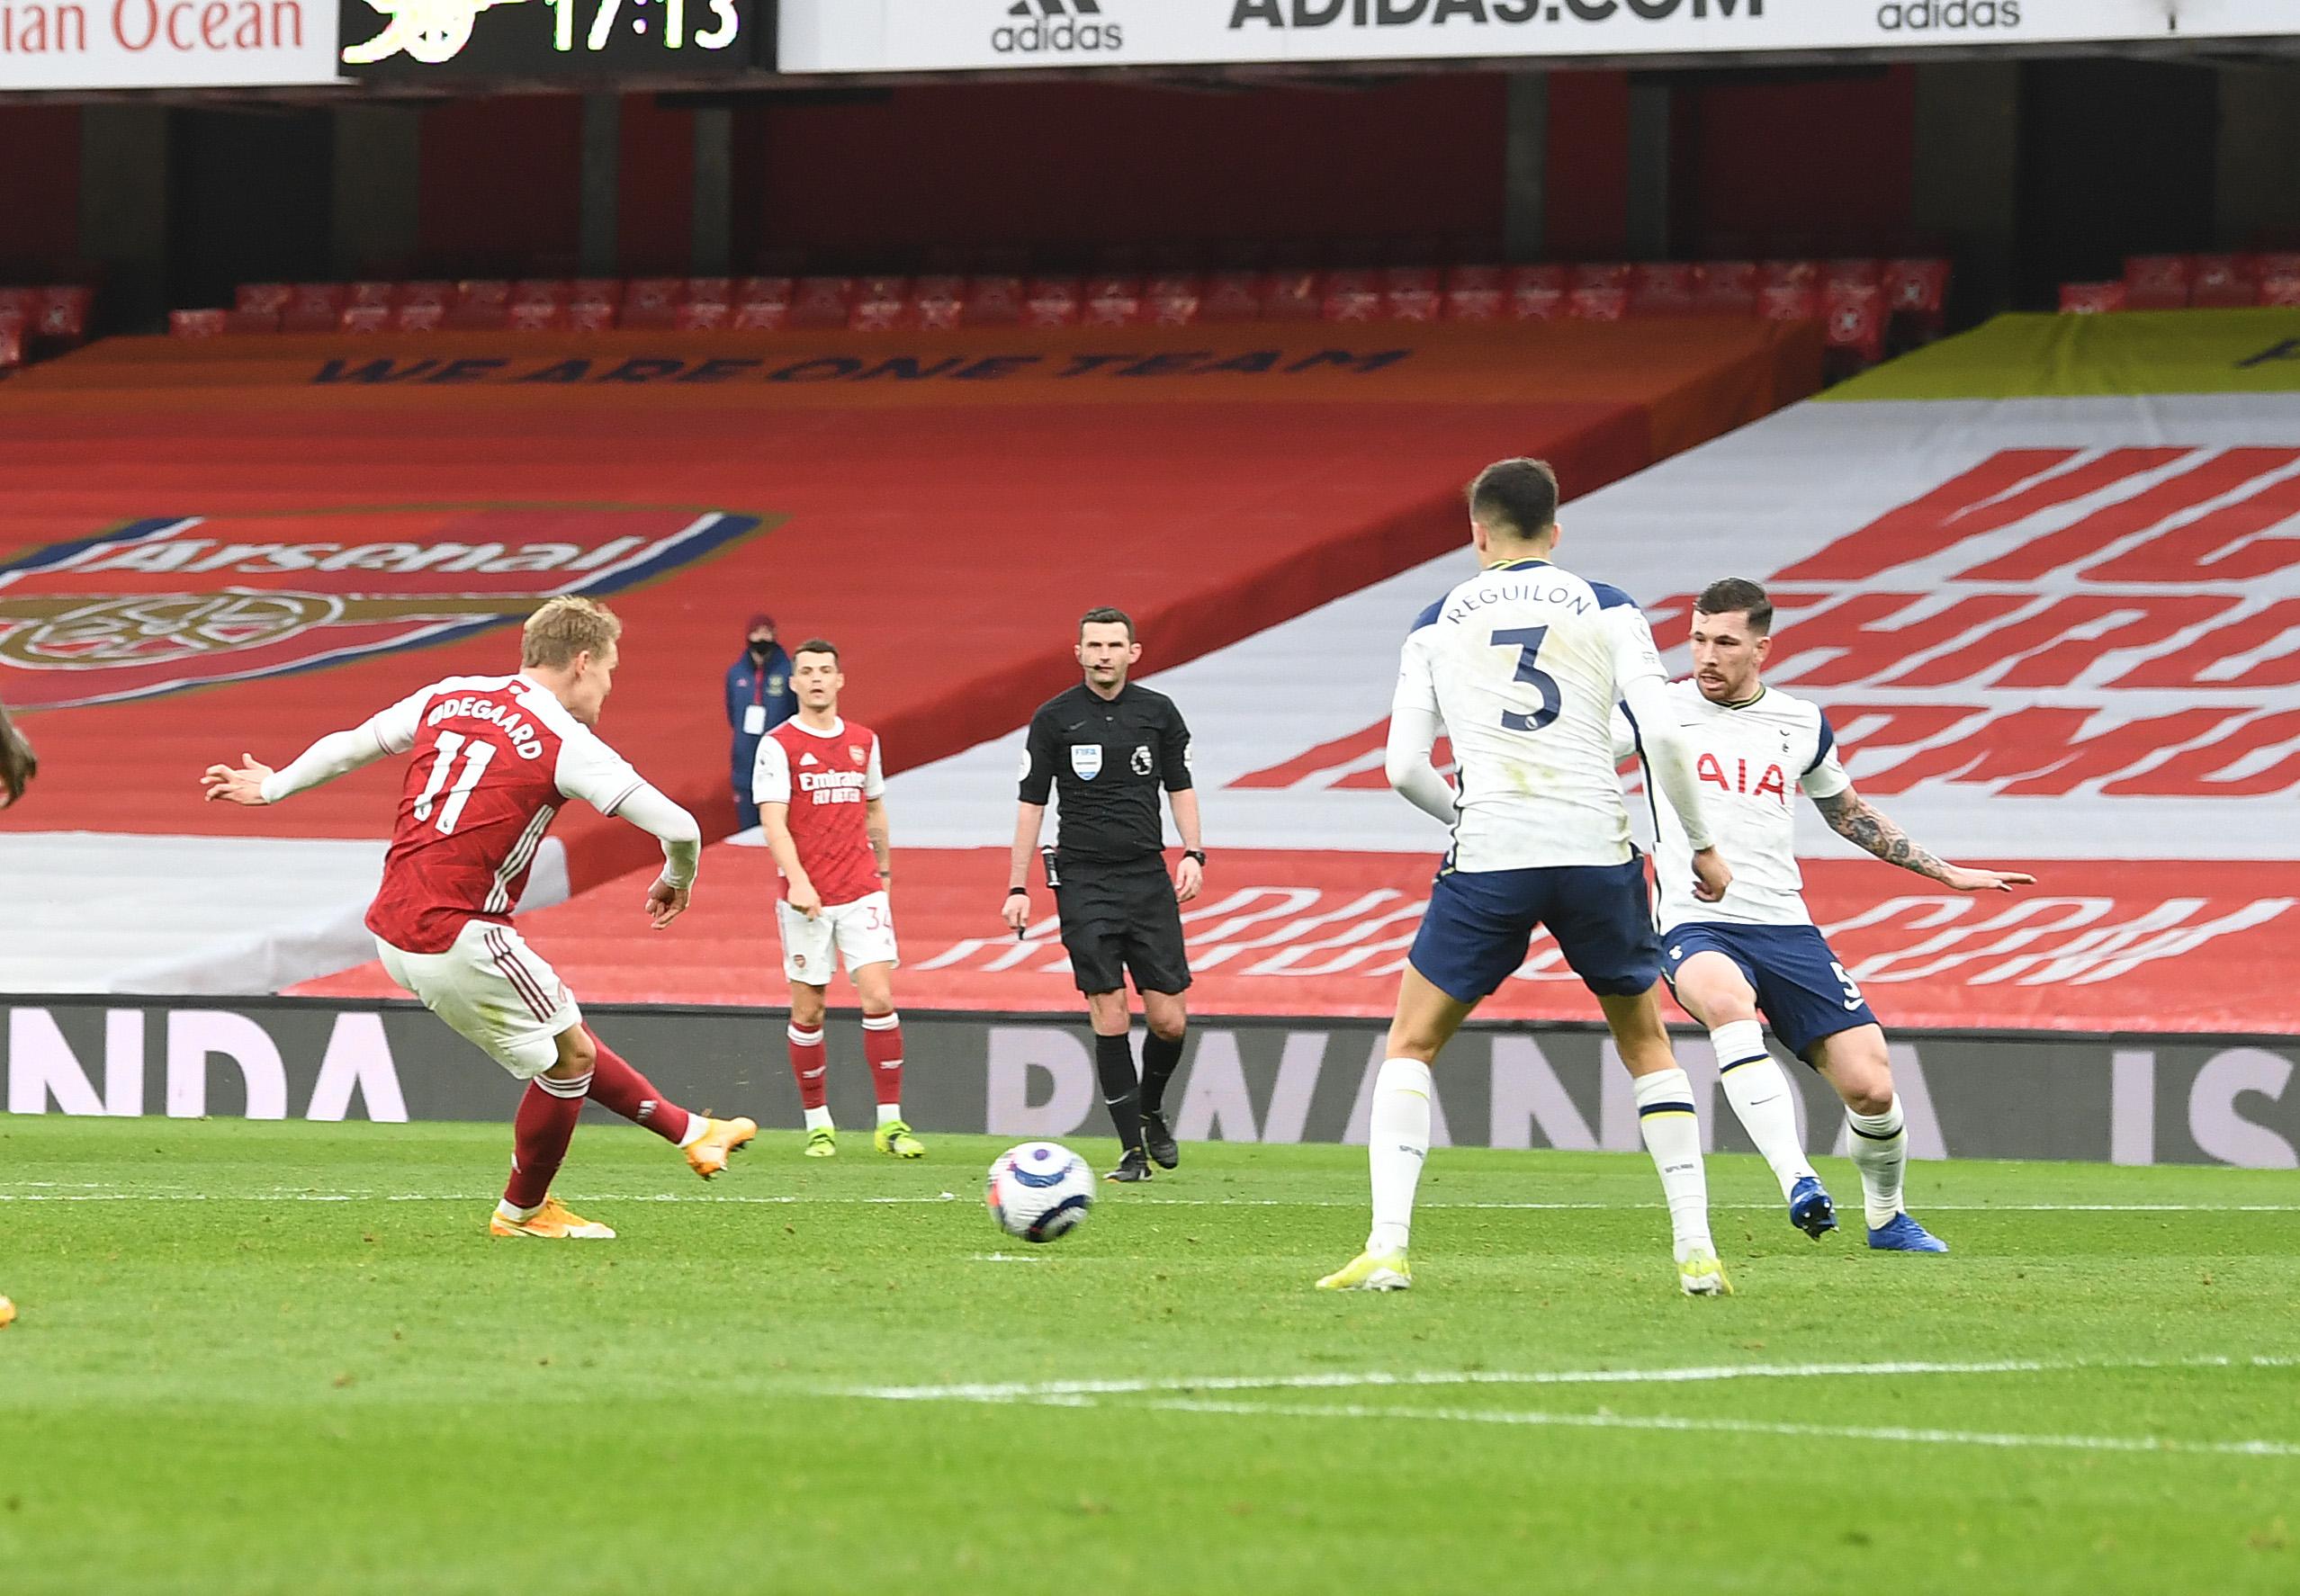 Martin Odegaard scoring in the north London derby